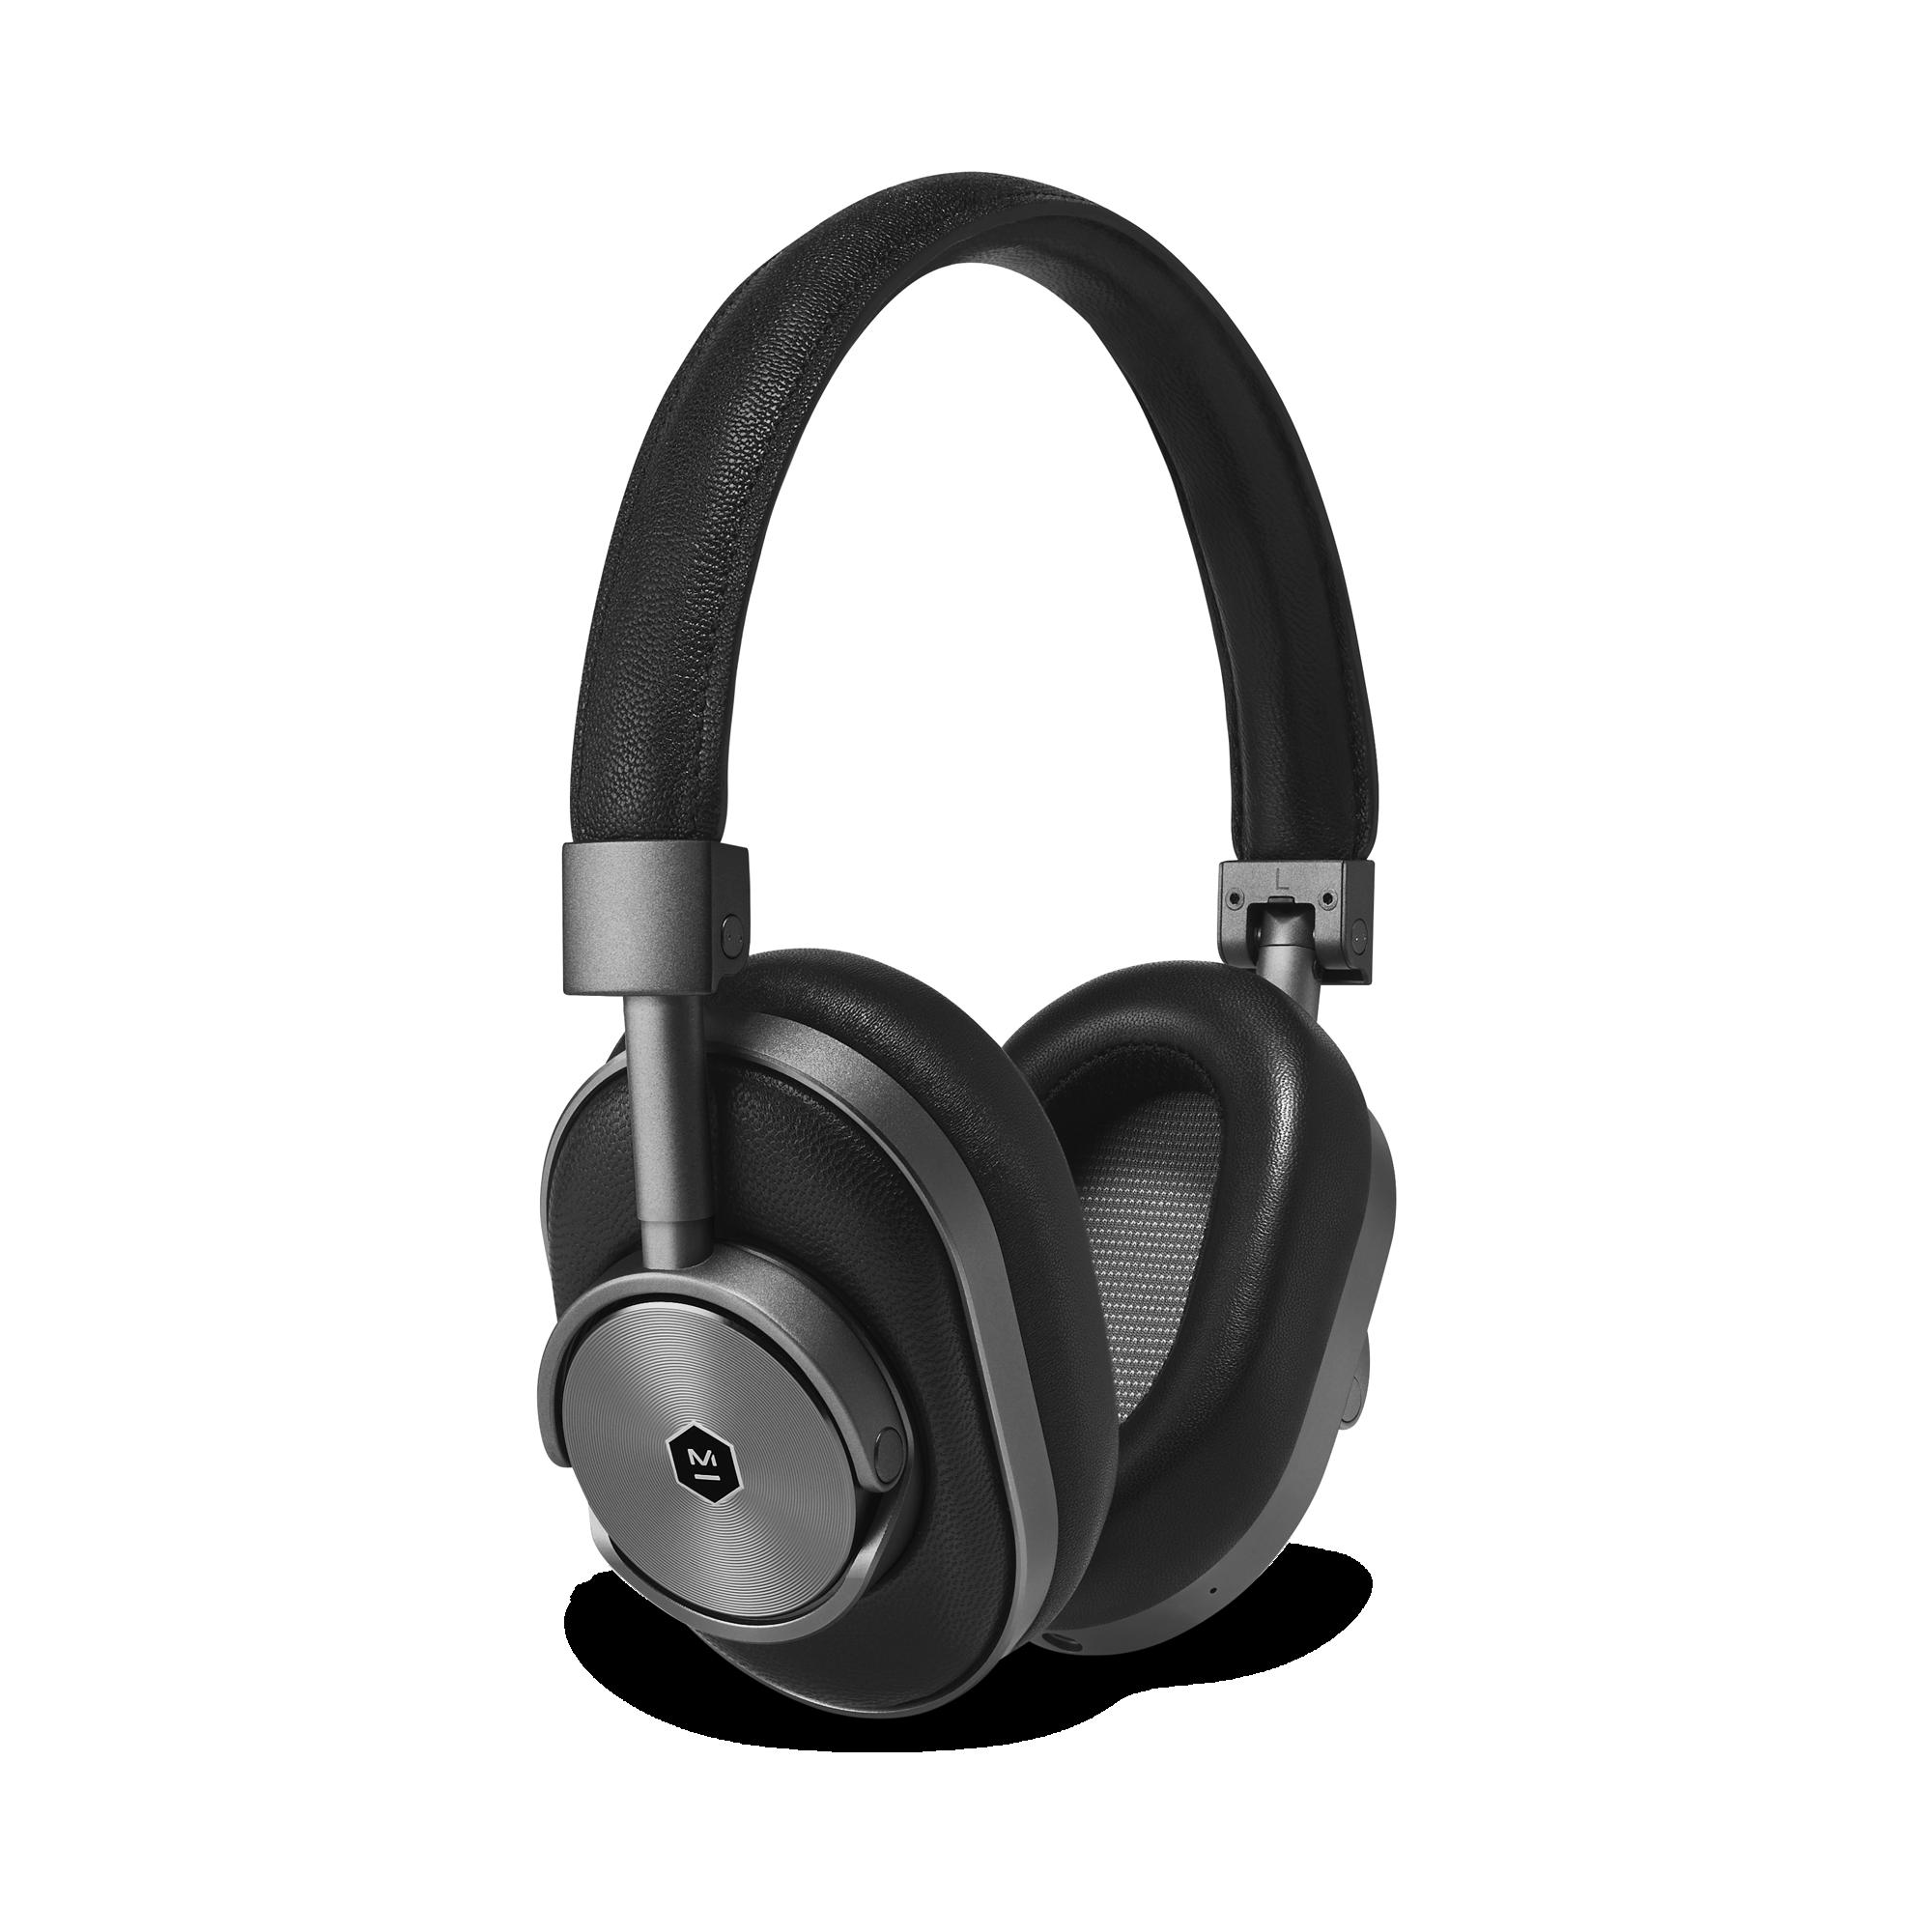 mw60-wireless-over-ear-headphones-gunmetal-1